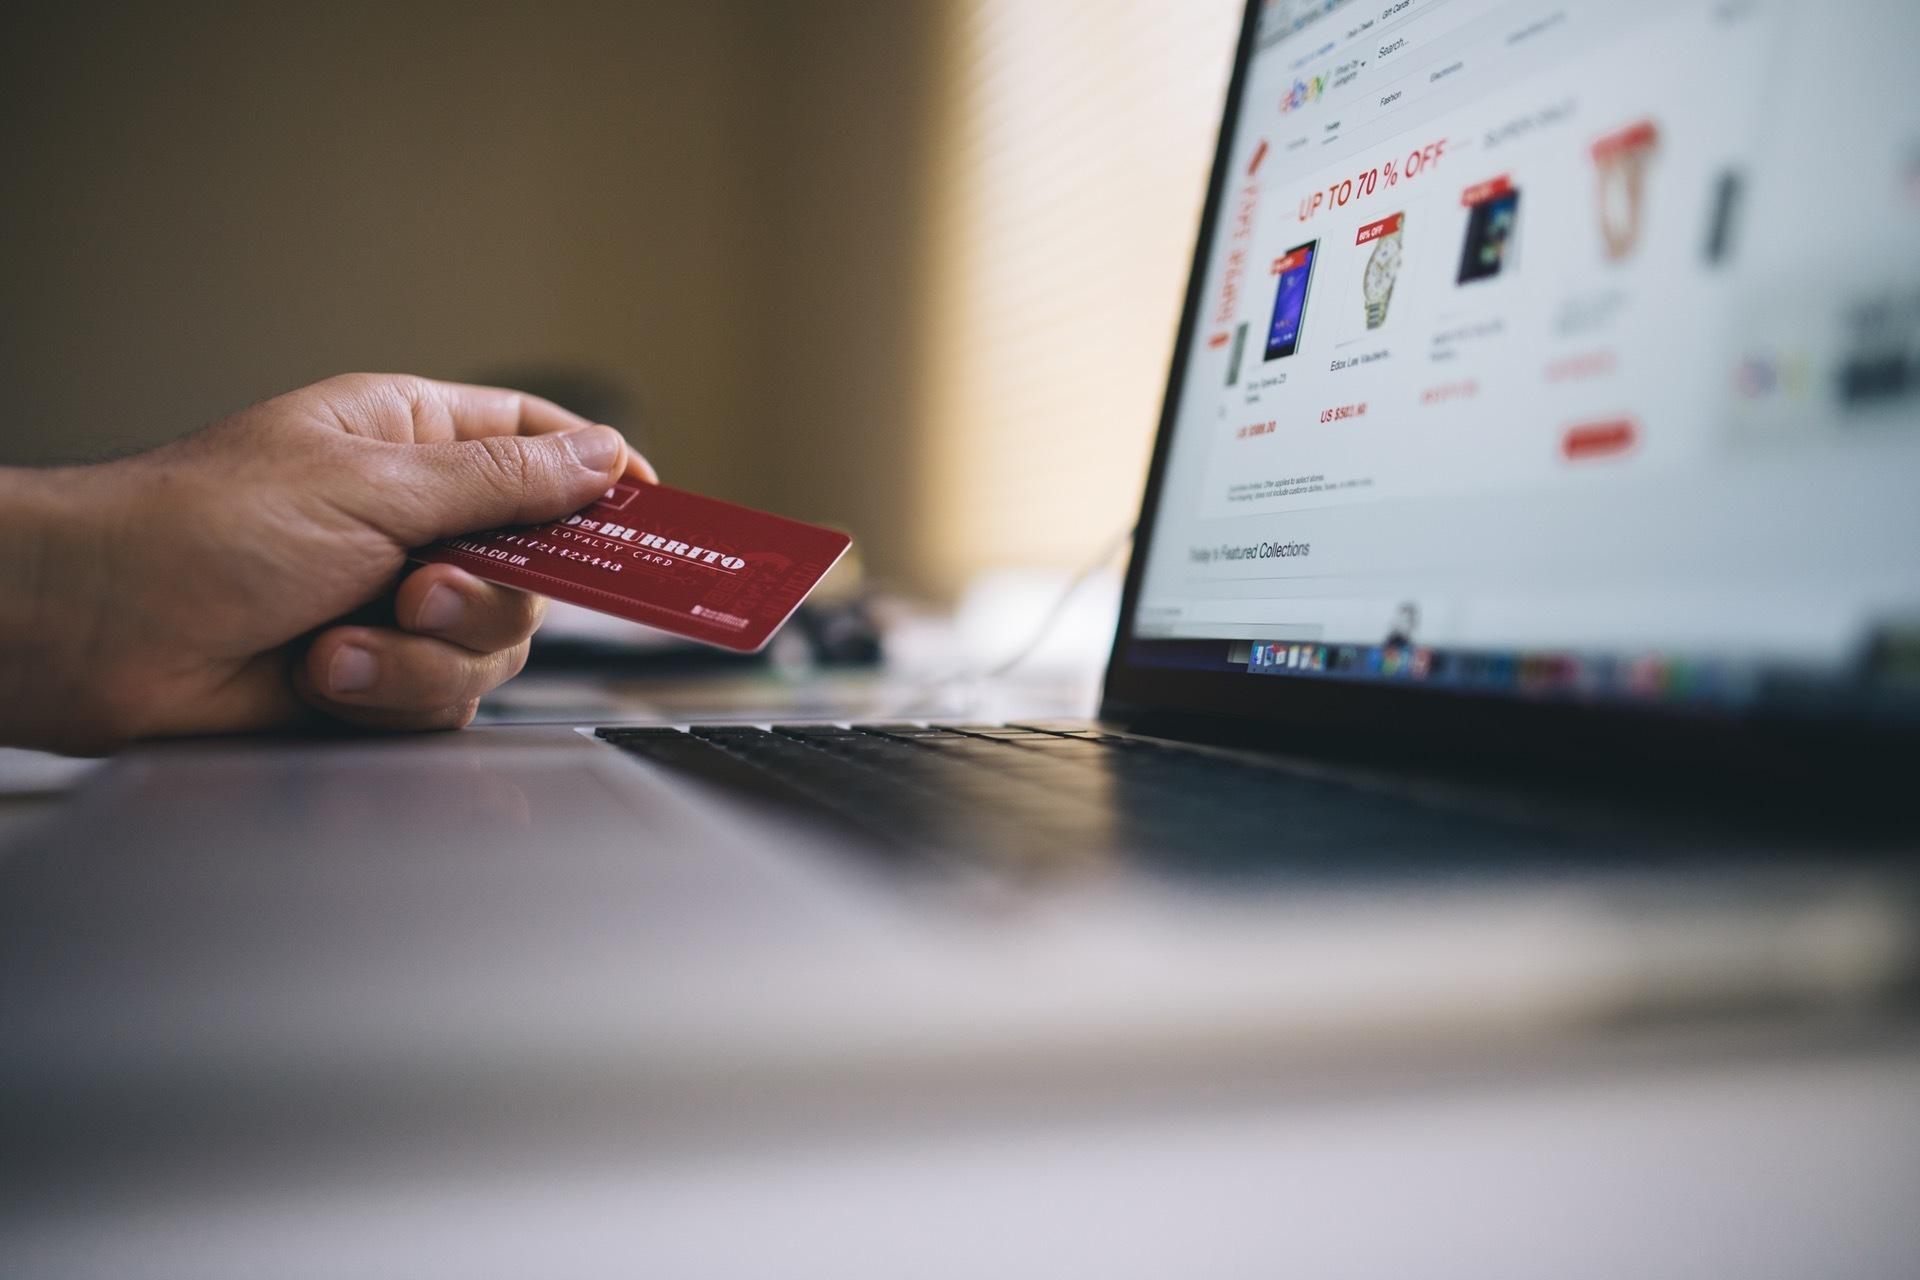 computer-platform-economy-money